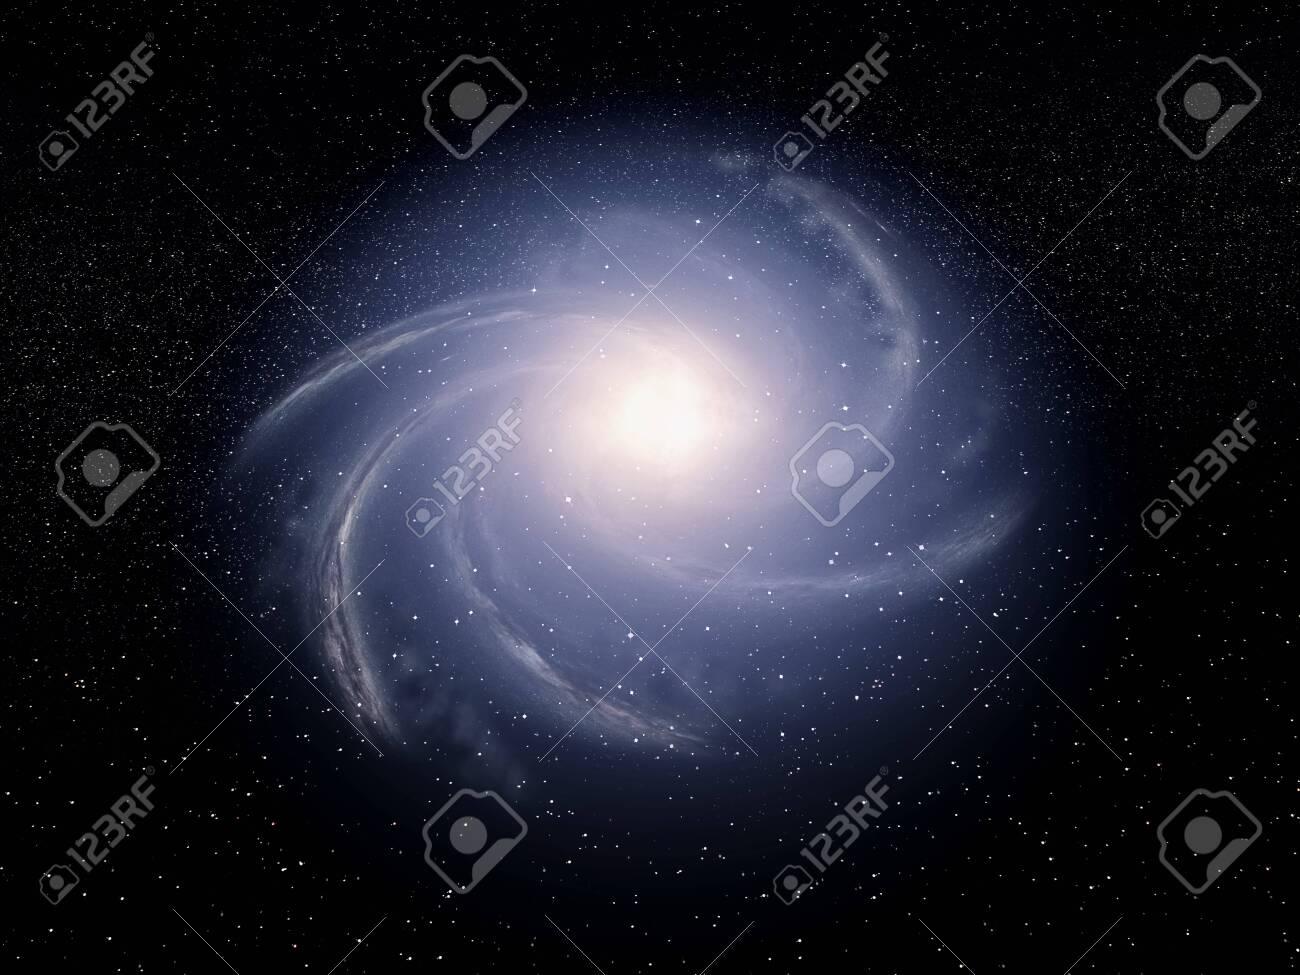 Artist view of a galaxy - 146300367